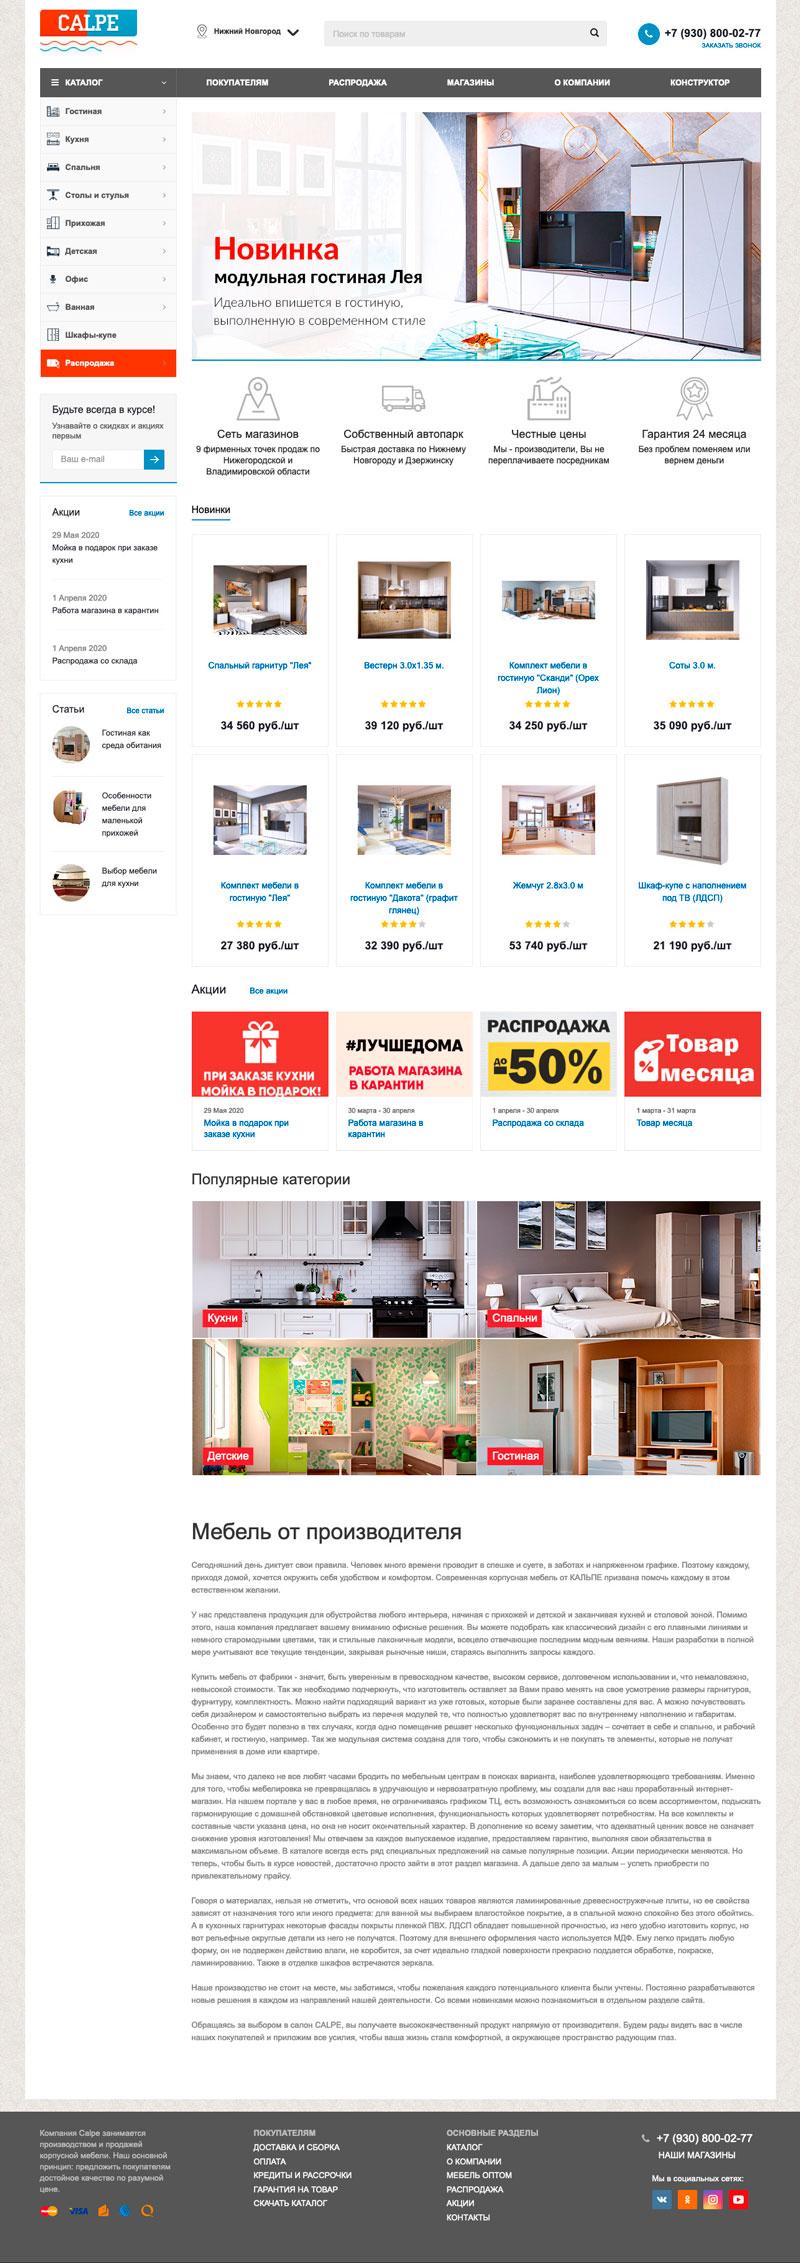 Интернет-магазин мебели Calpe